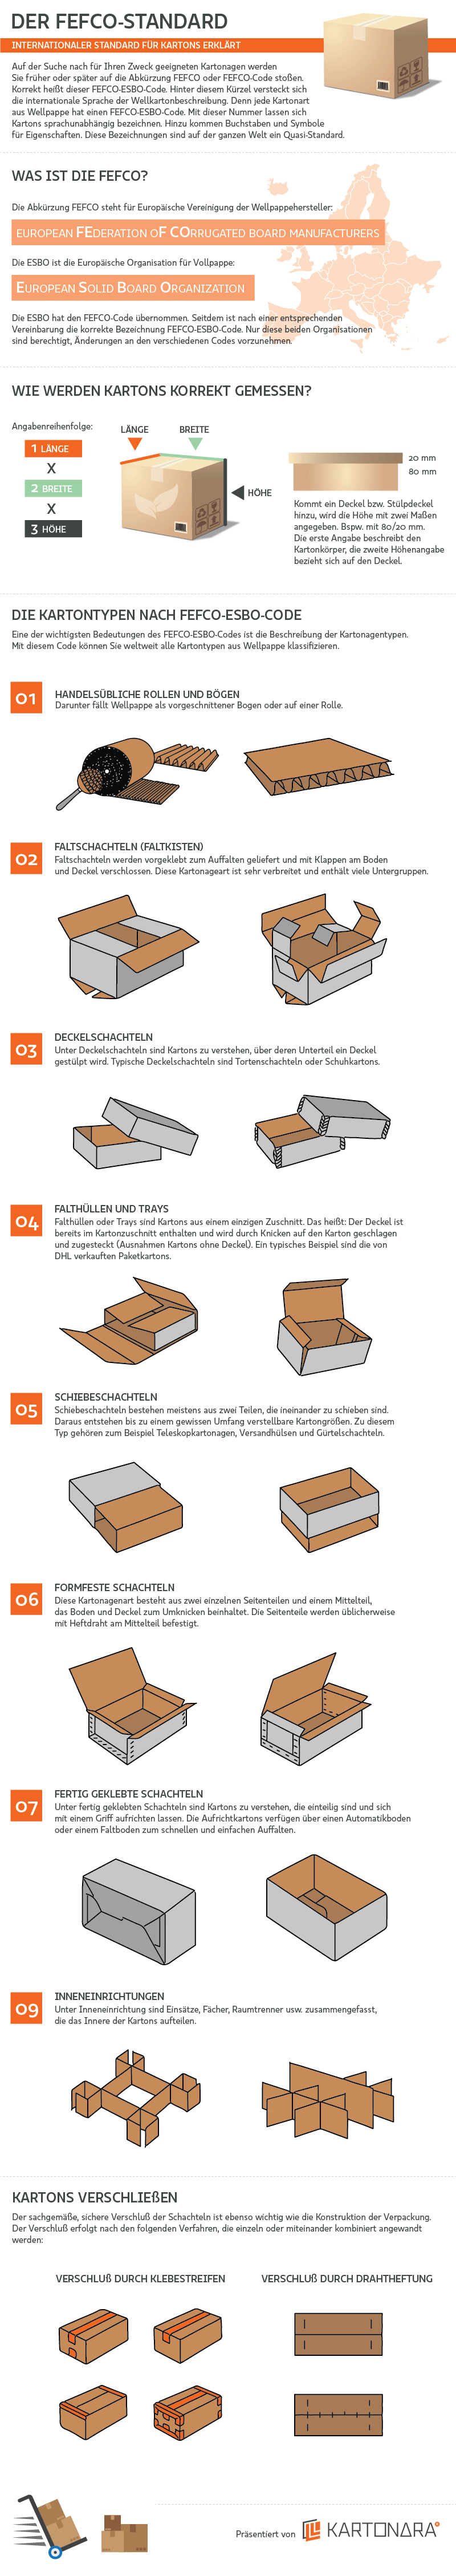 Der FEFCO-Code Standard als Infografik